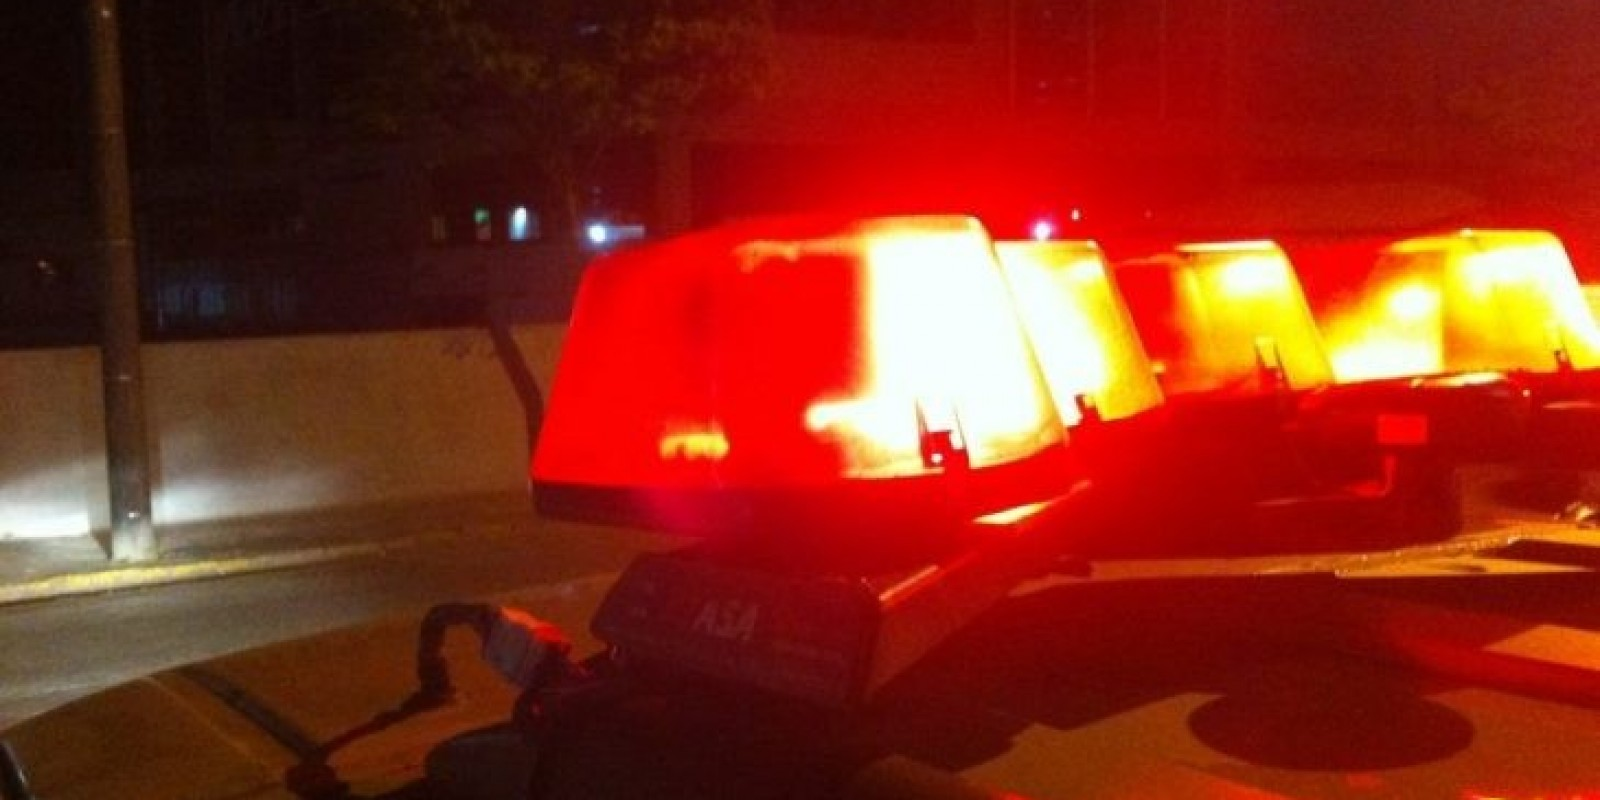 Tentativa de feminicídio: neto desfere dez facadas contra avó em Orleans